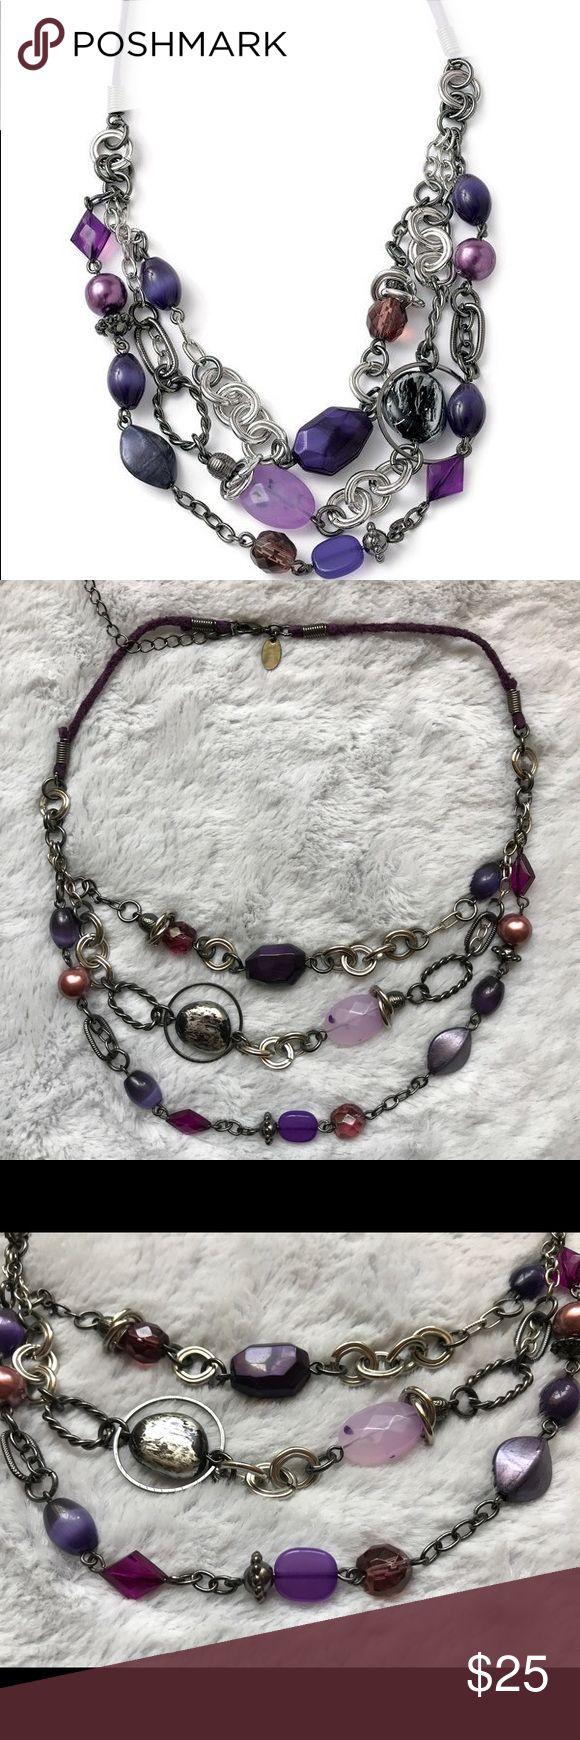 "Lia Sophia Purple Haze Necklace Lia Sophia Purple Haze Necklace. Glass Cat's Eye In Glass Stones In Purple Tones. Adjustable 16-19"" Long. Lia Sophia Jewelry Necklaces"